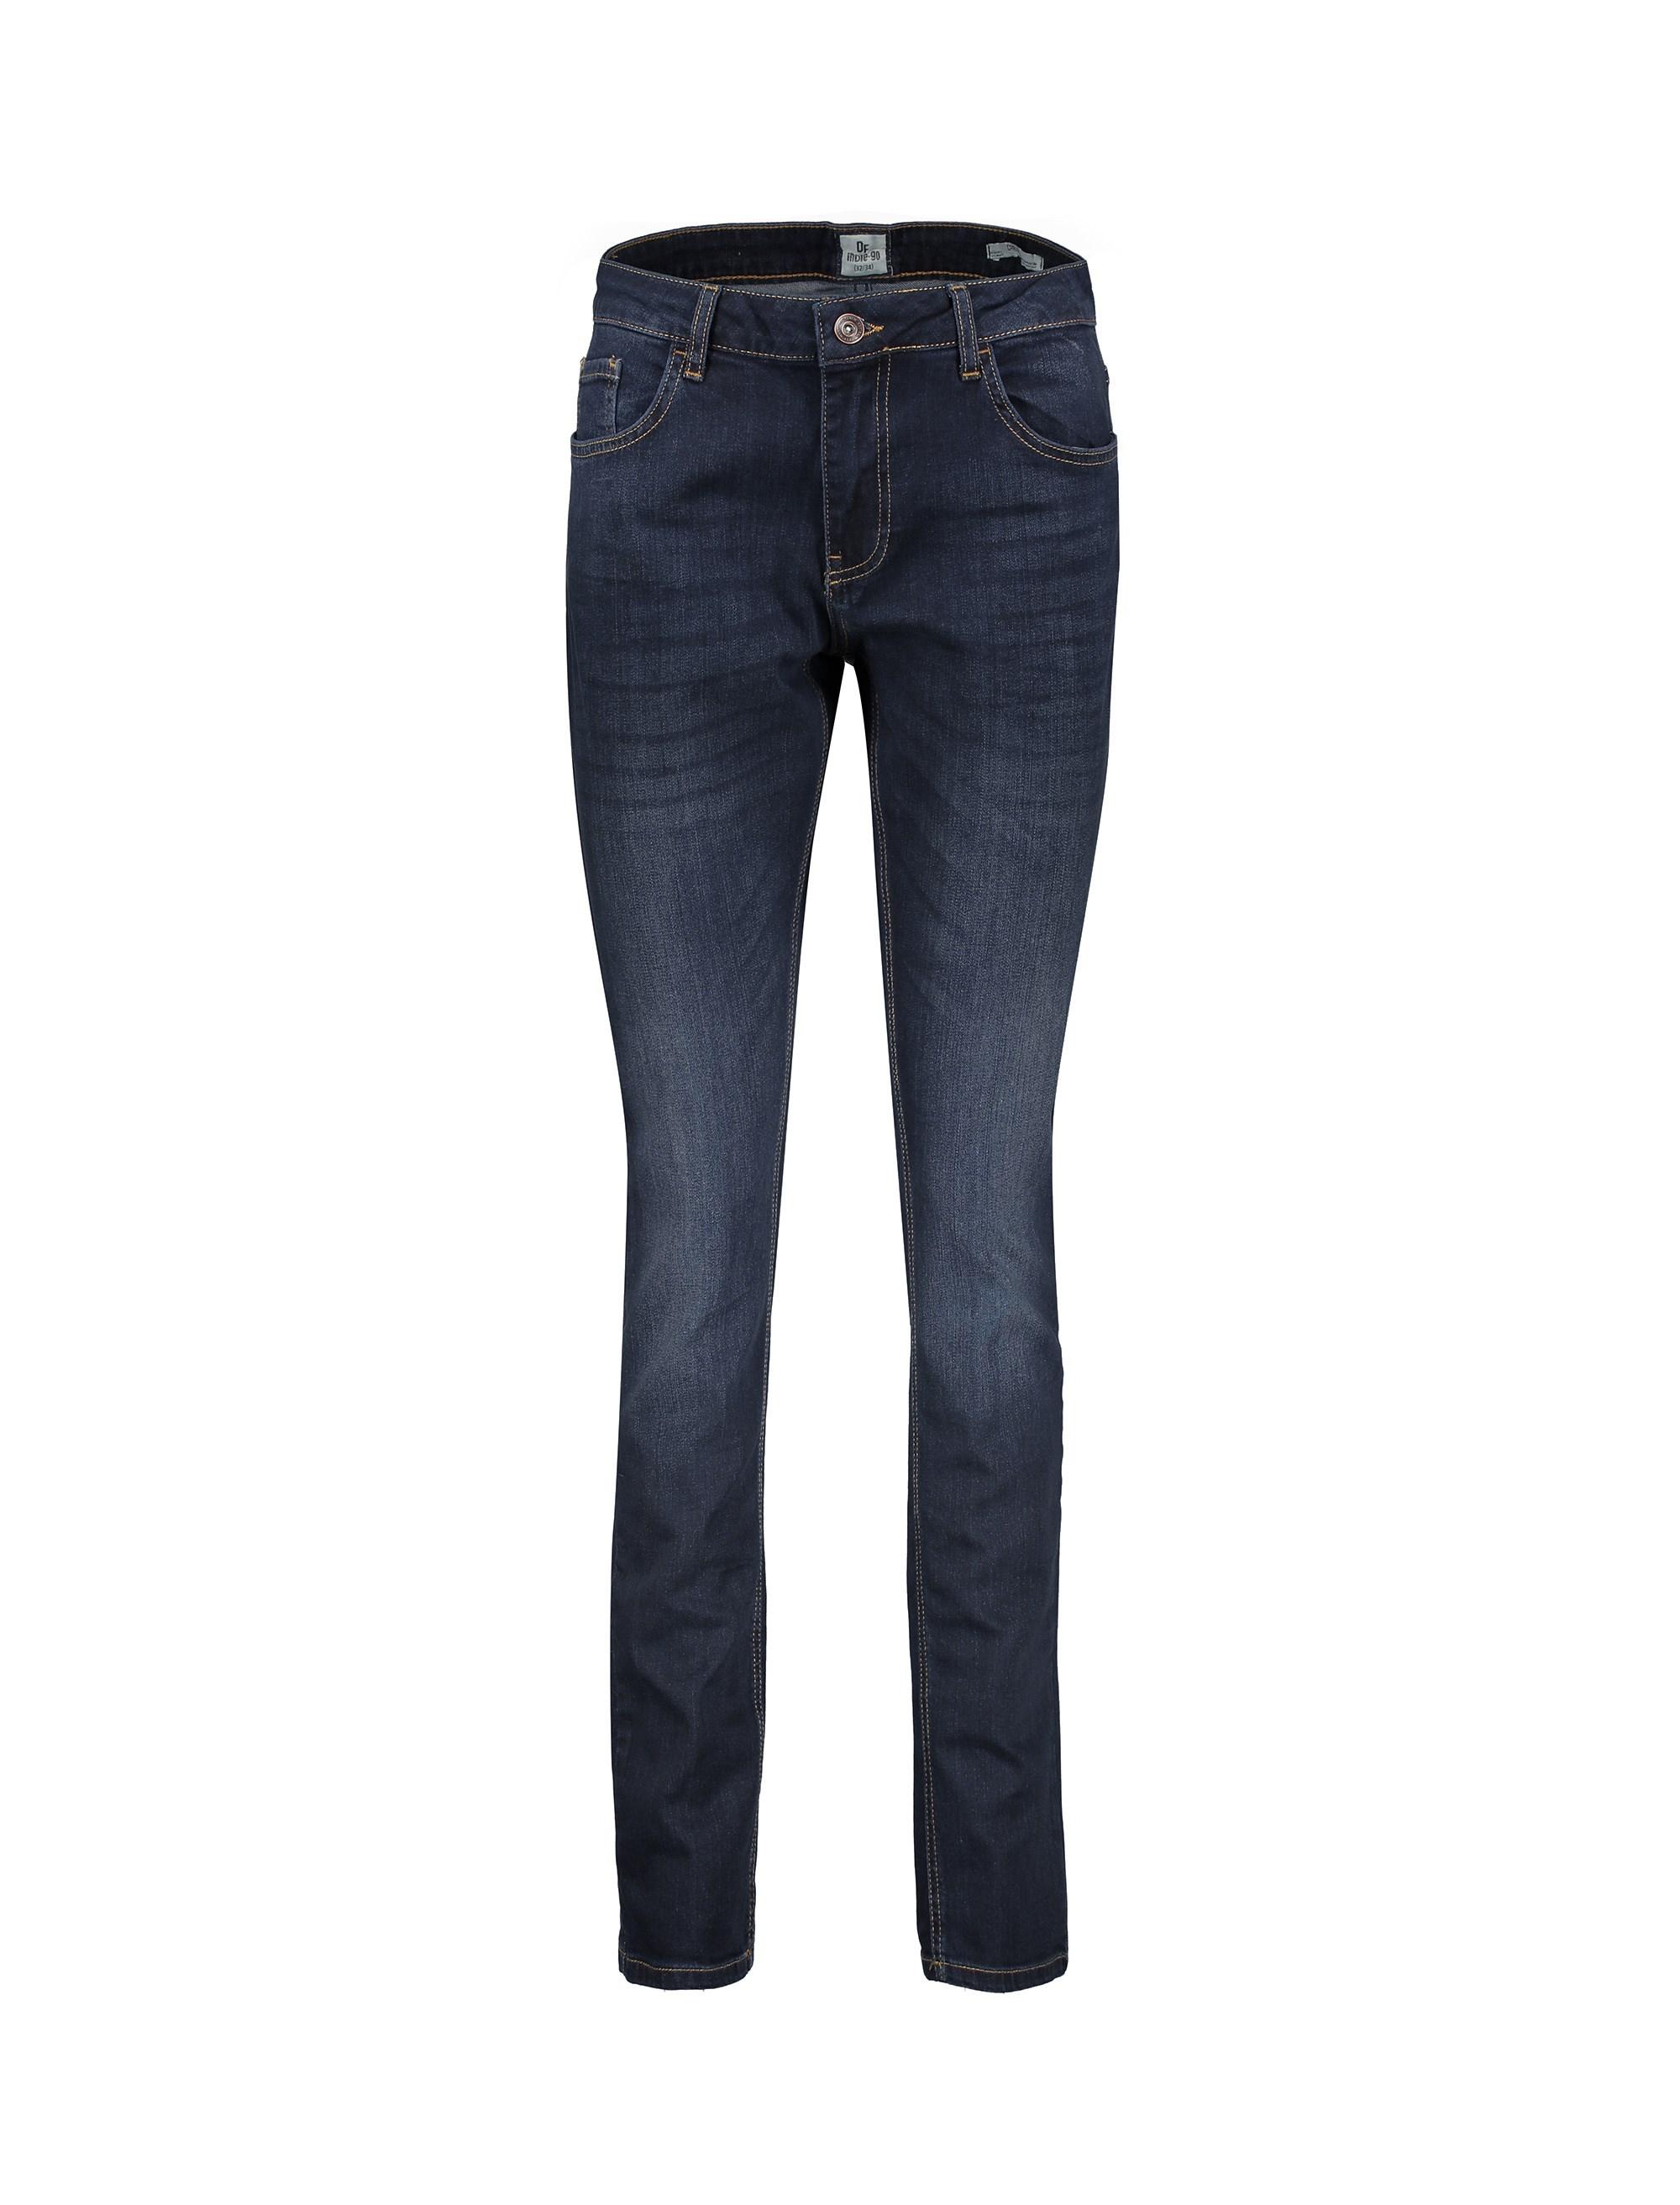 شلوار جین راسته مردانه - سرمه اي - 1